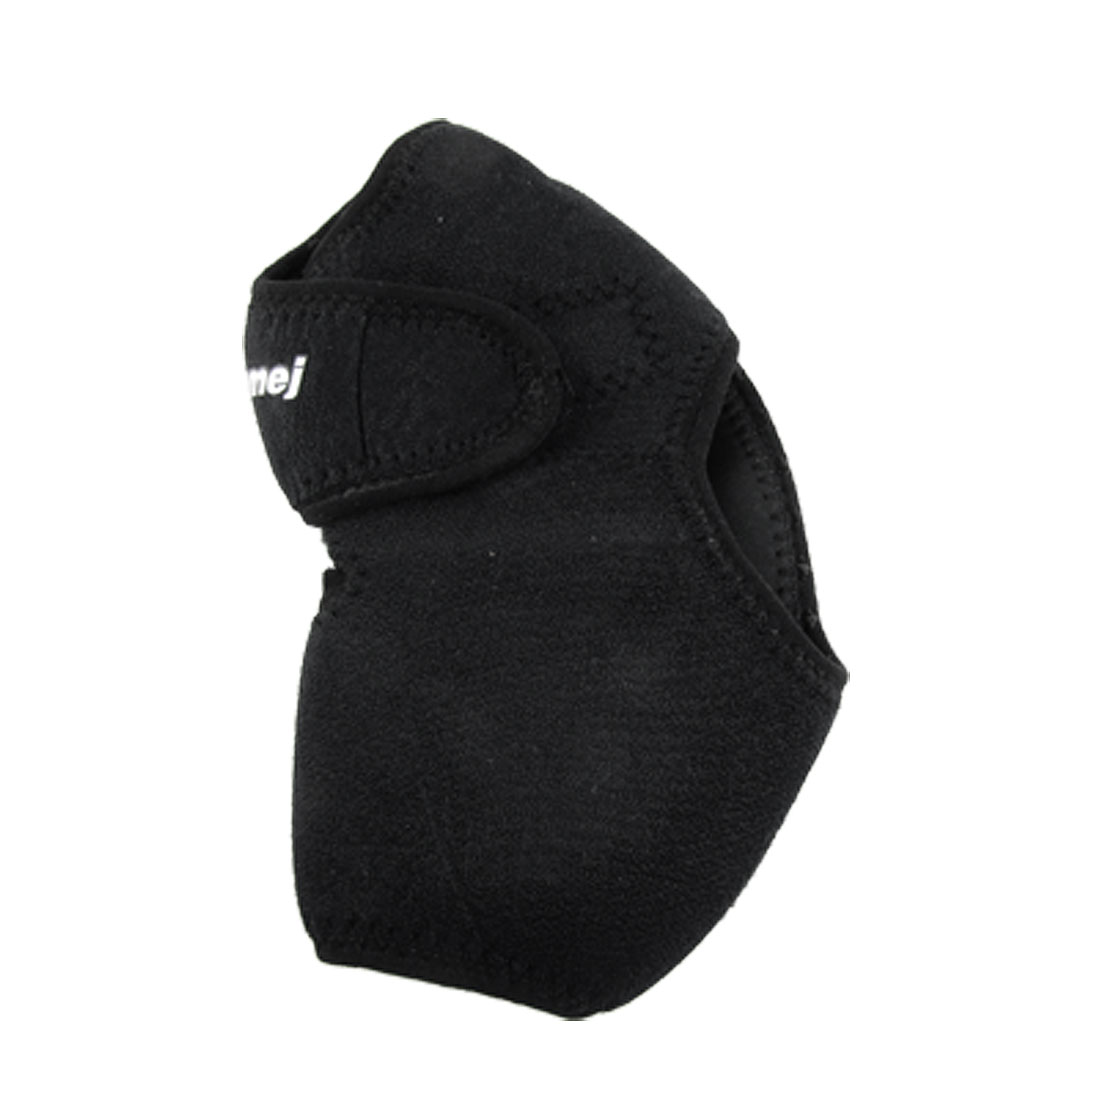 Black Detachable Closure Ankle Brace Neoprene Sport Support